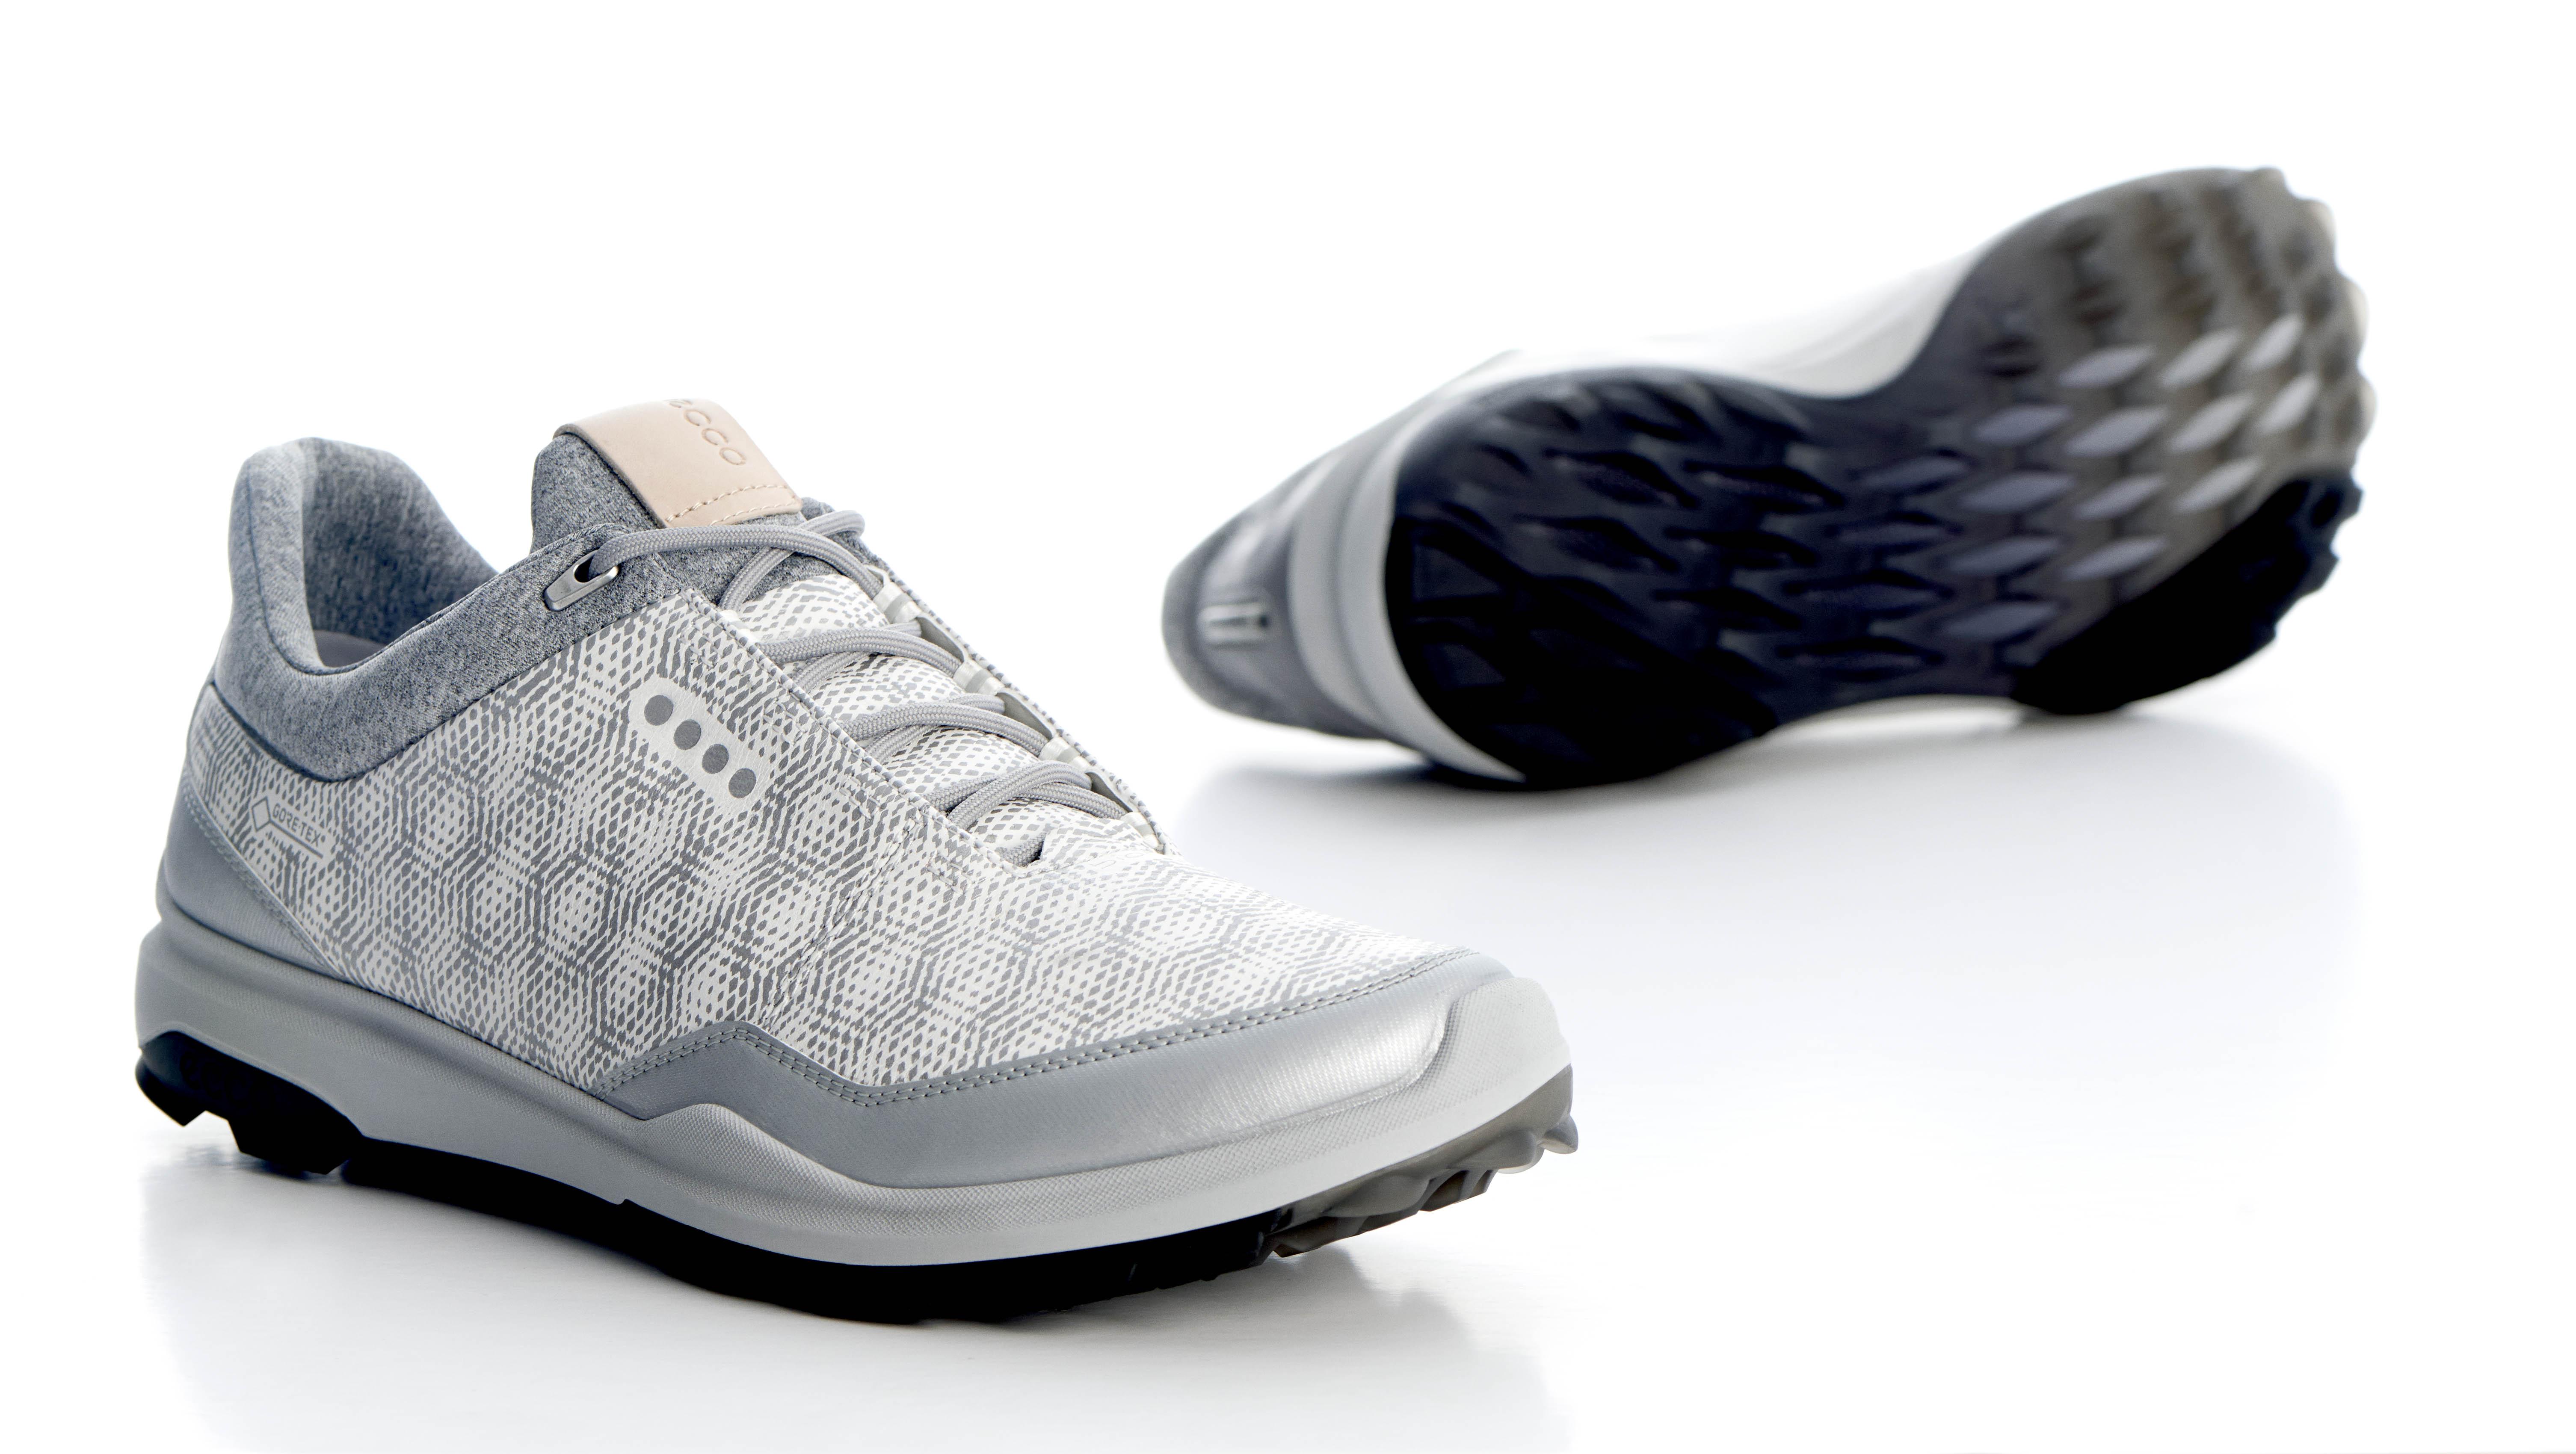 Golf Biom Hybrid 3 GTX Golf Shoes 5EzJ3nZK